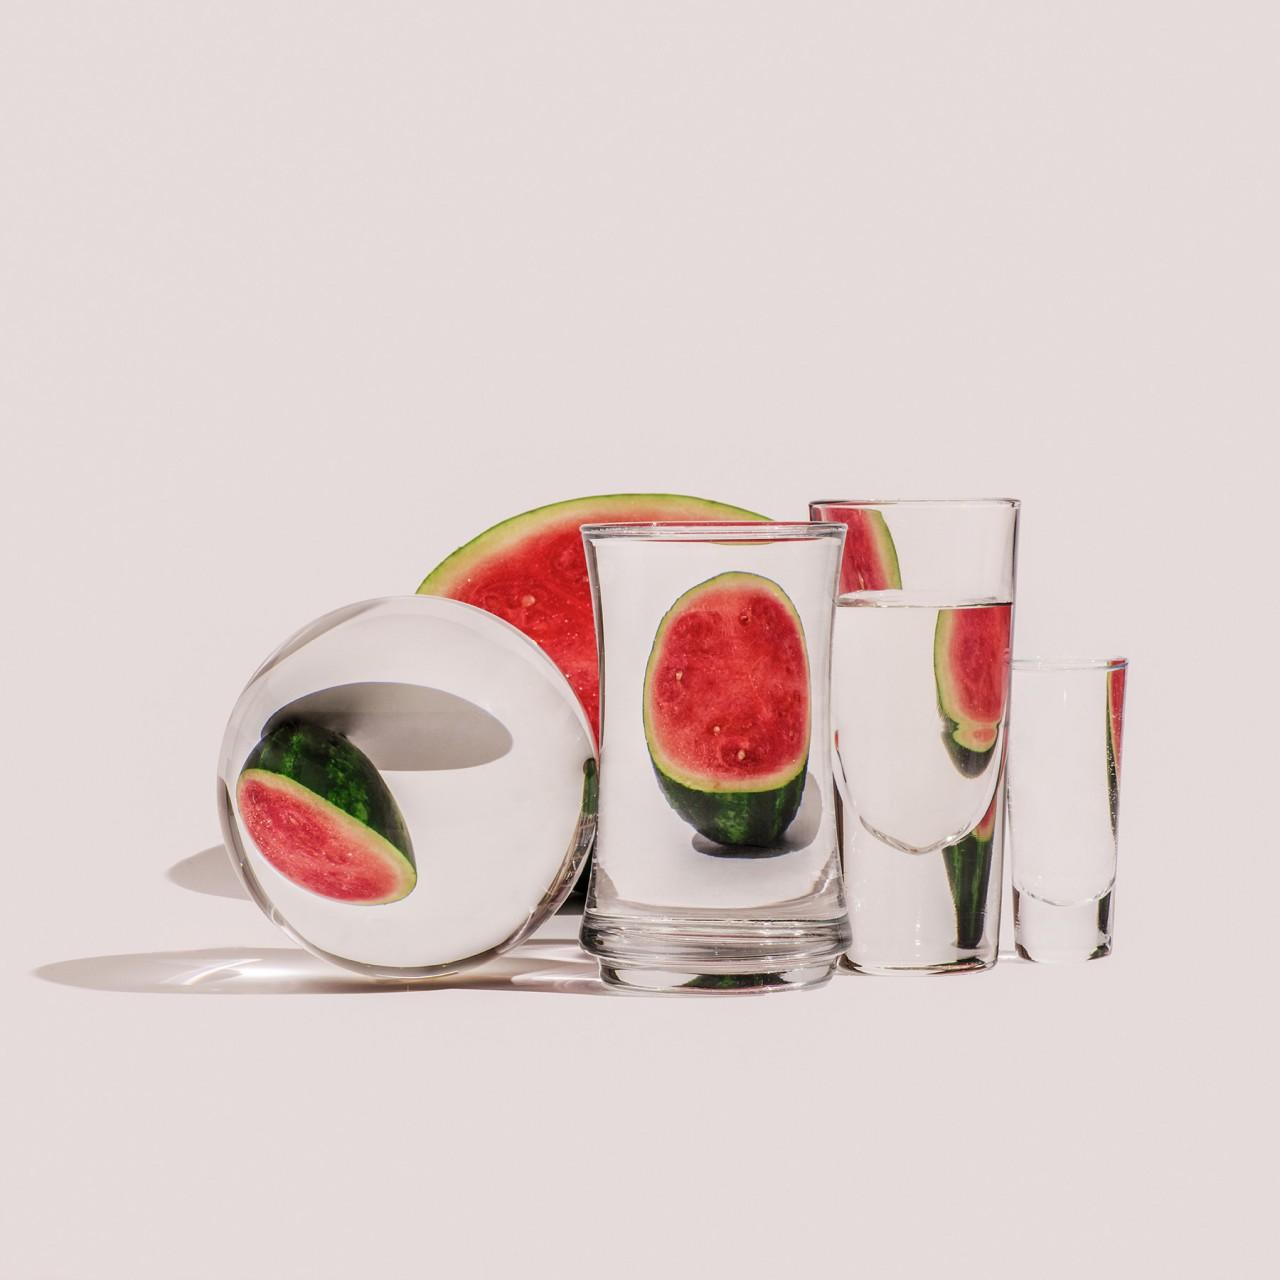 Watermelon.SuzanneSaroff-640x640@2x